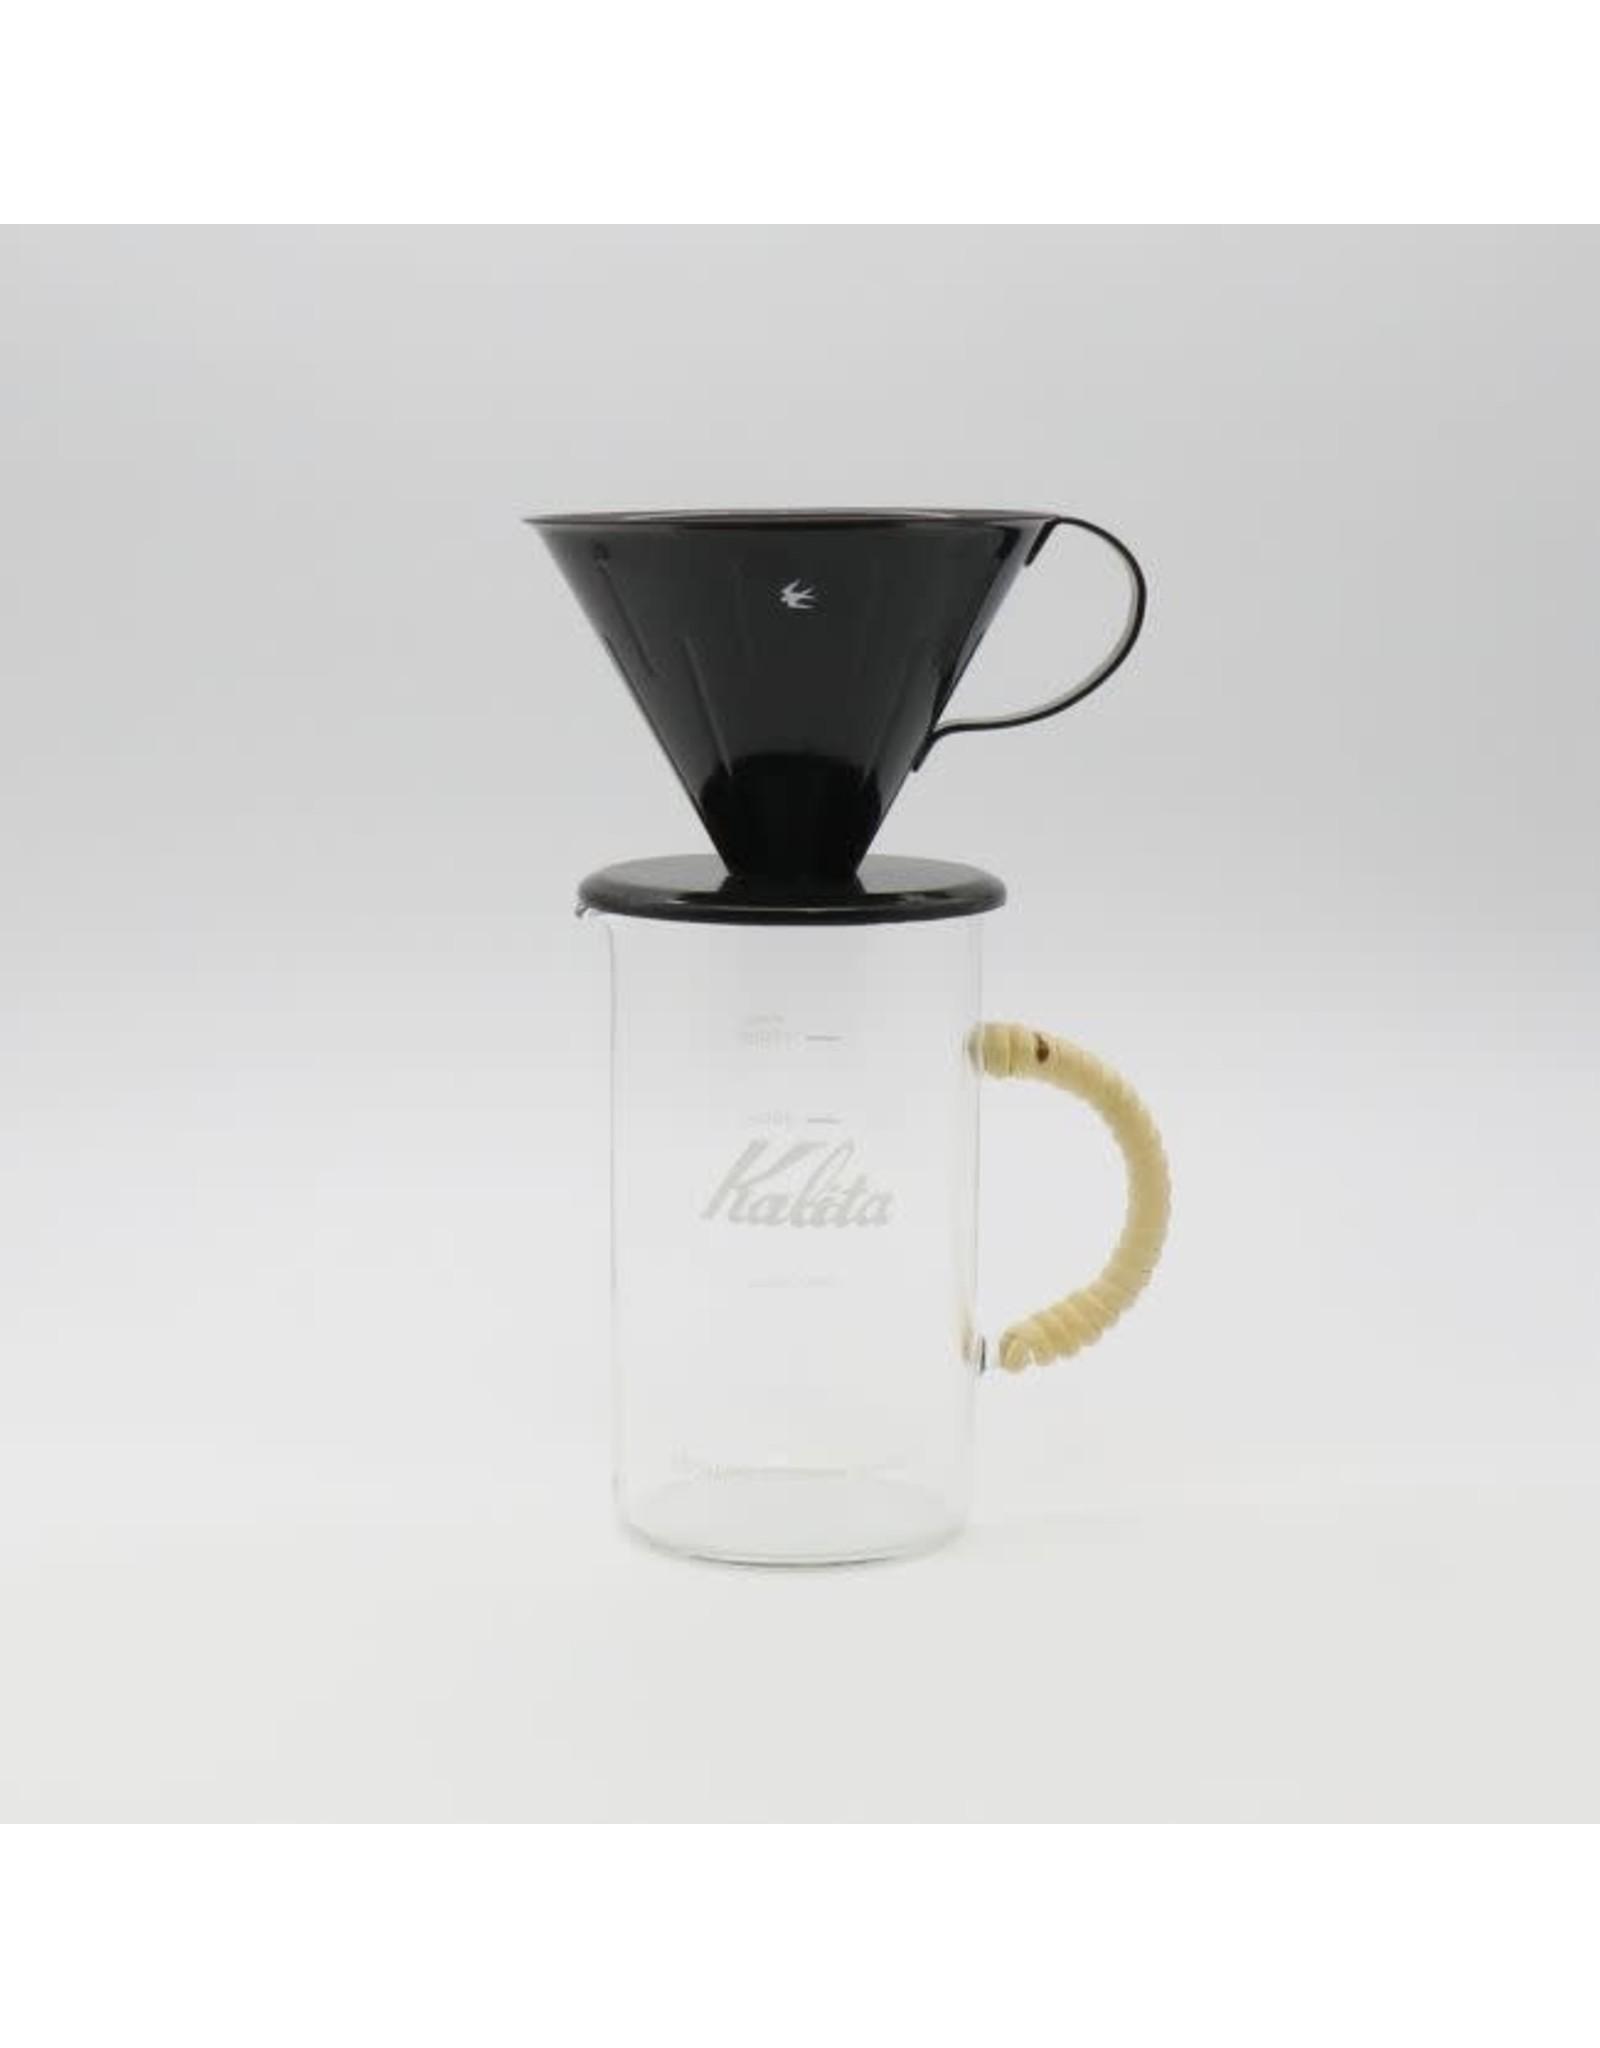 GSP GSP TSUBAME COFFEE DRIPPER 4.0 BLACK